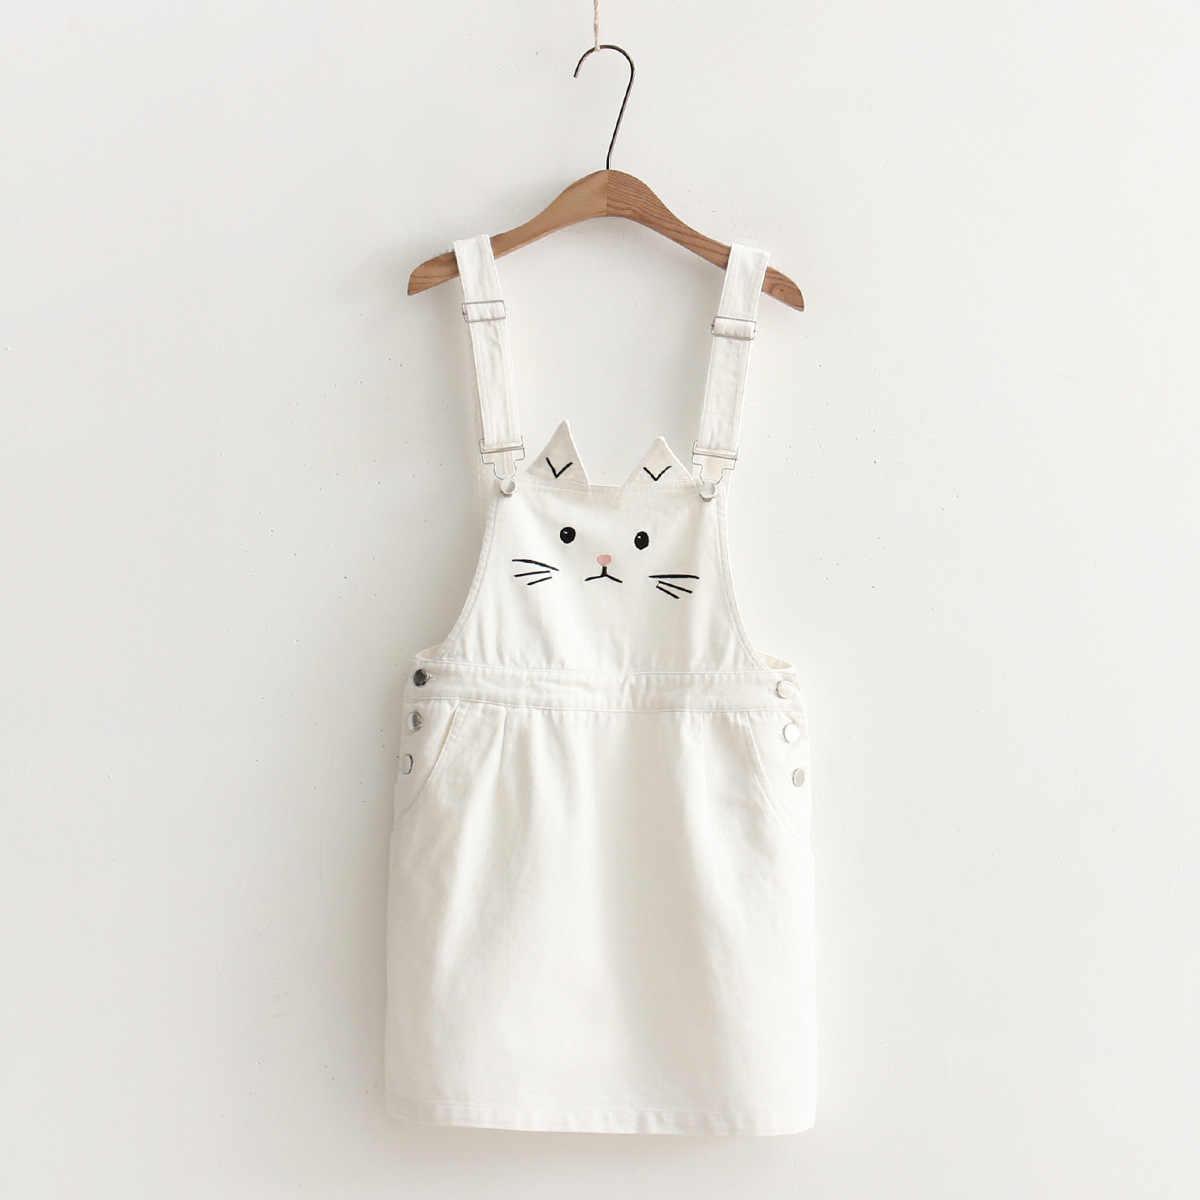 64d22827fe ... VEVEFHUANG Japanese Mori Girl Women Cute Cat Dress Kawaii Ear  Embroidery Denim Suspender Casual Overall Female ...